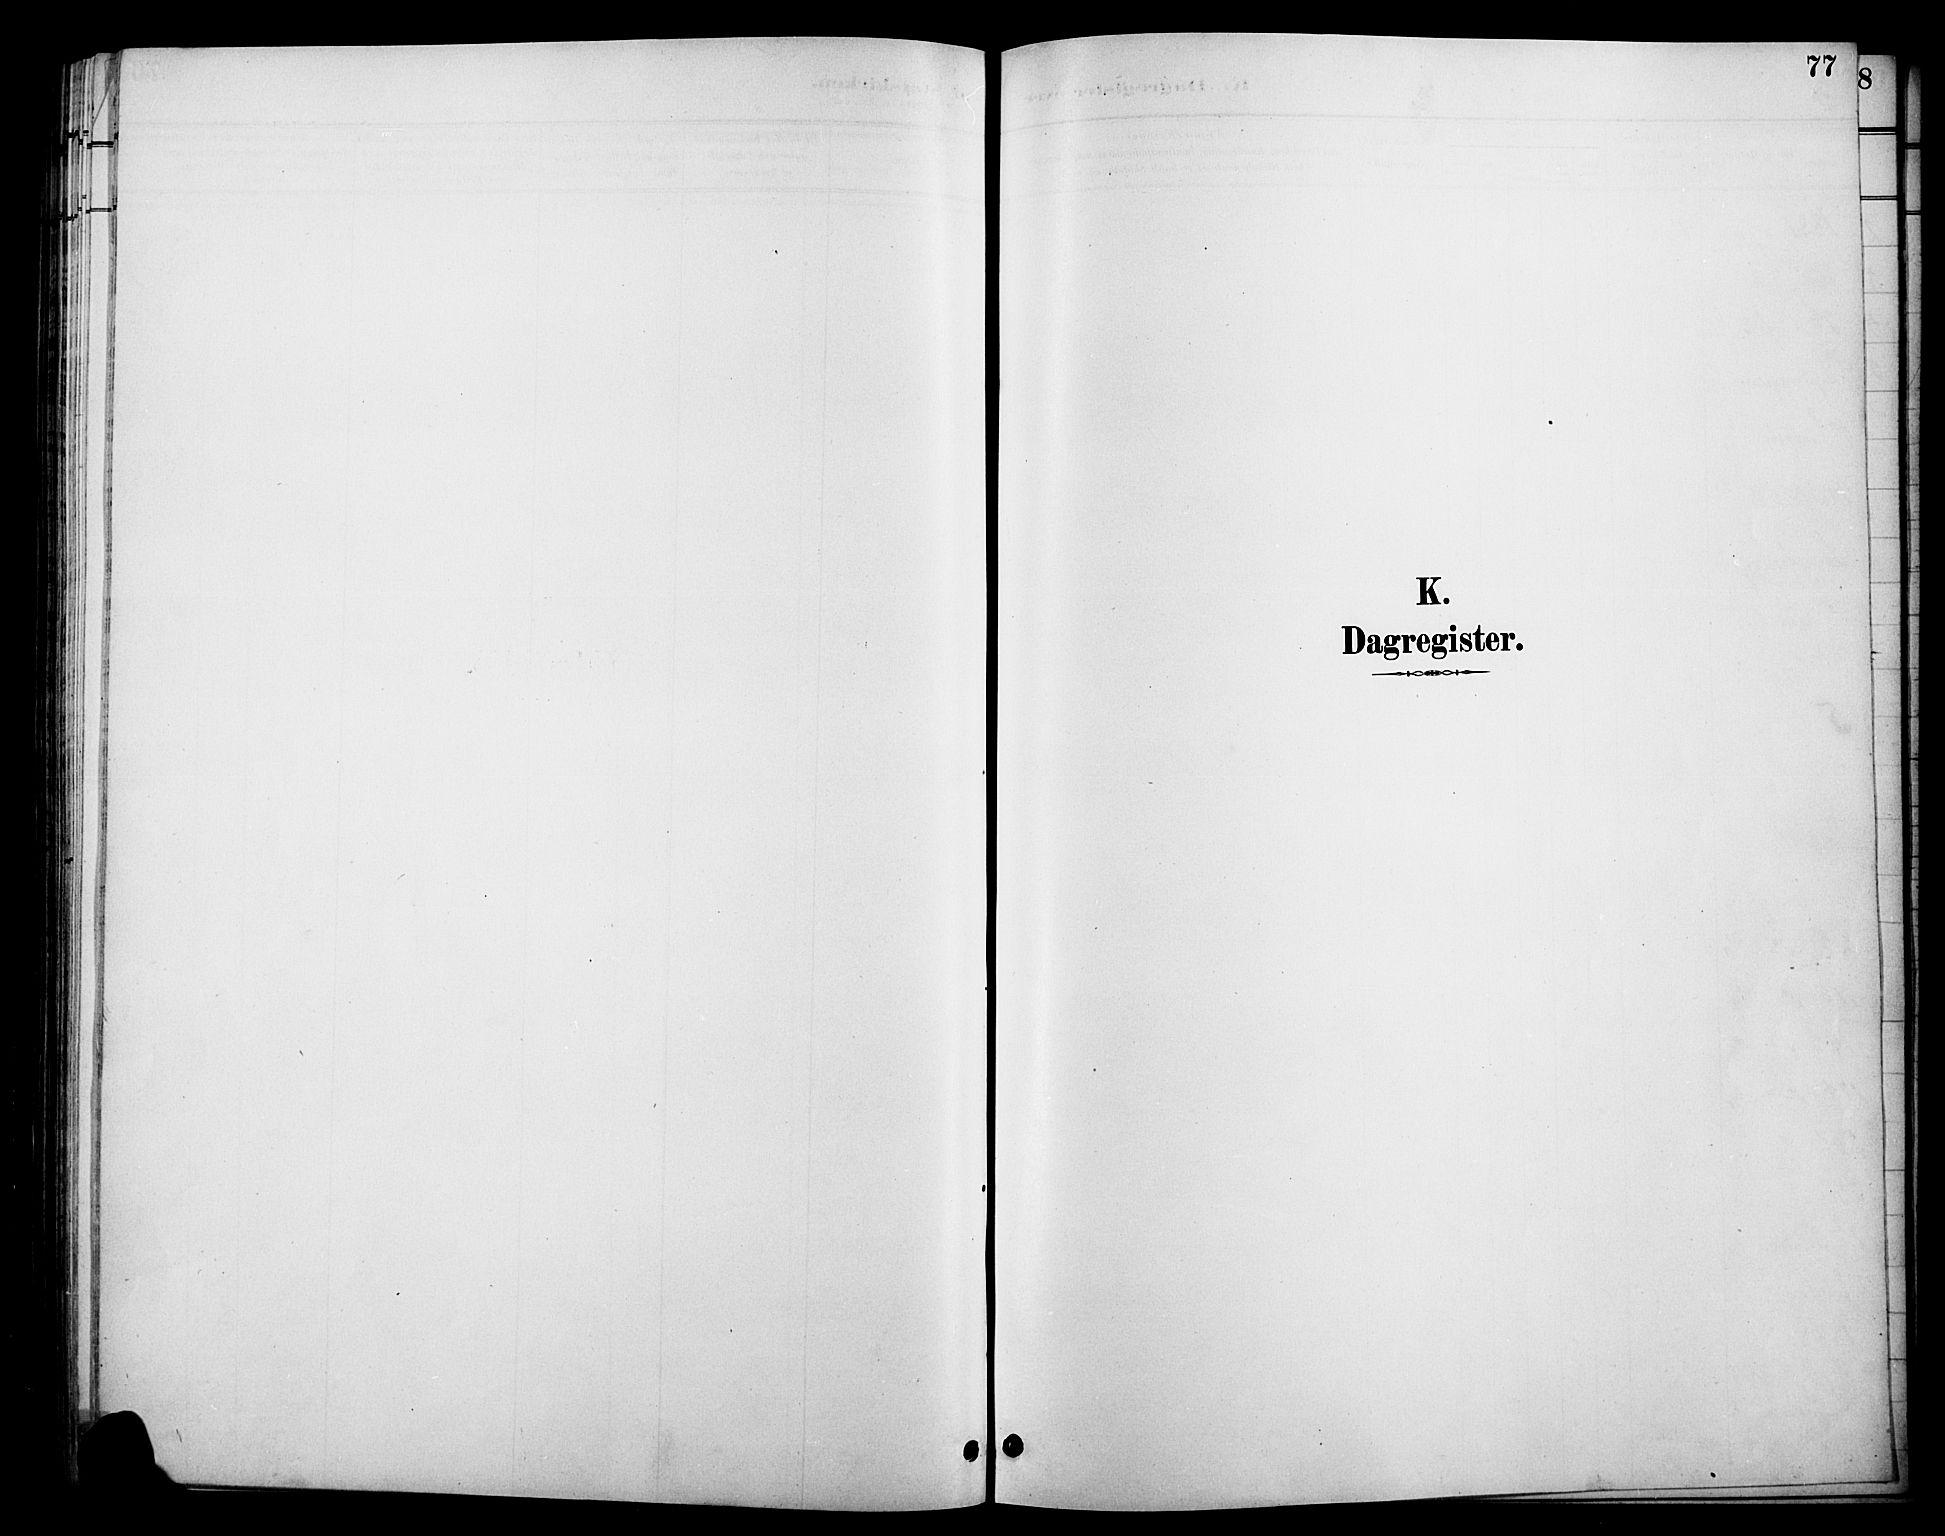 SAH, Øystre Slidre prestekontor, Klokkerbok nr. 6, 1887-1916, s. 77